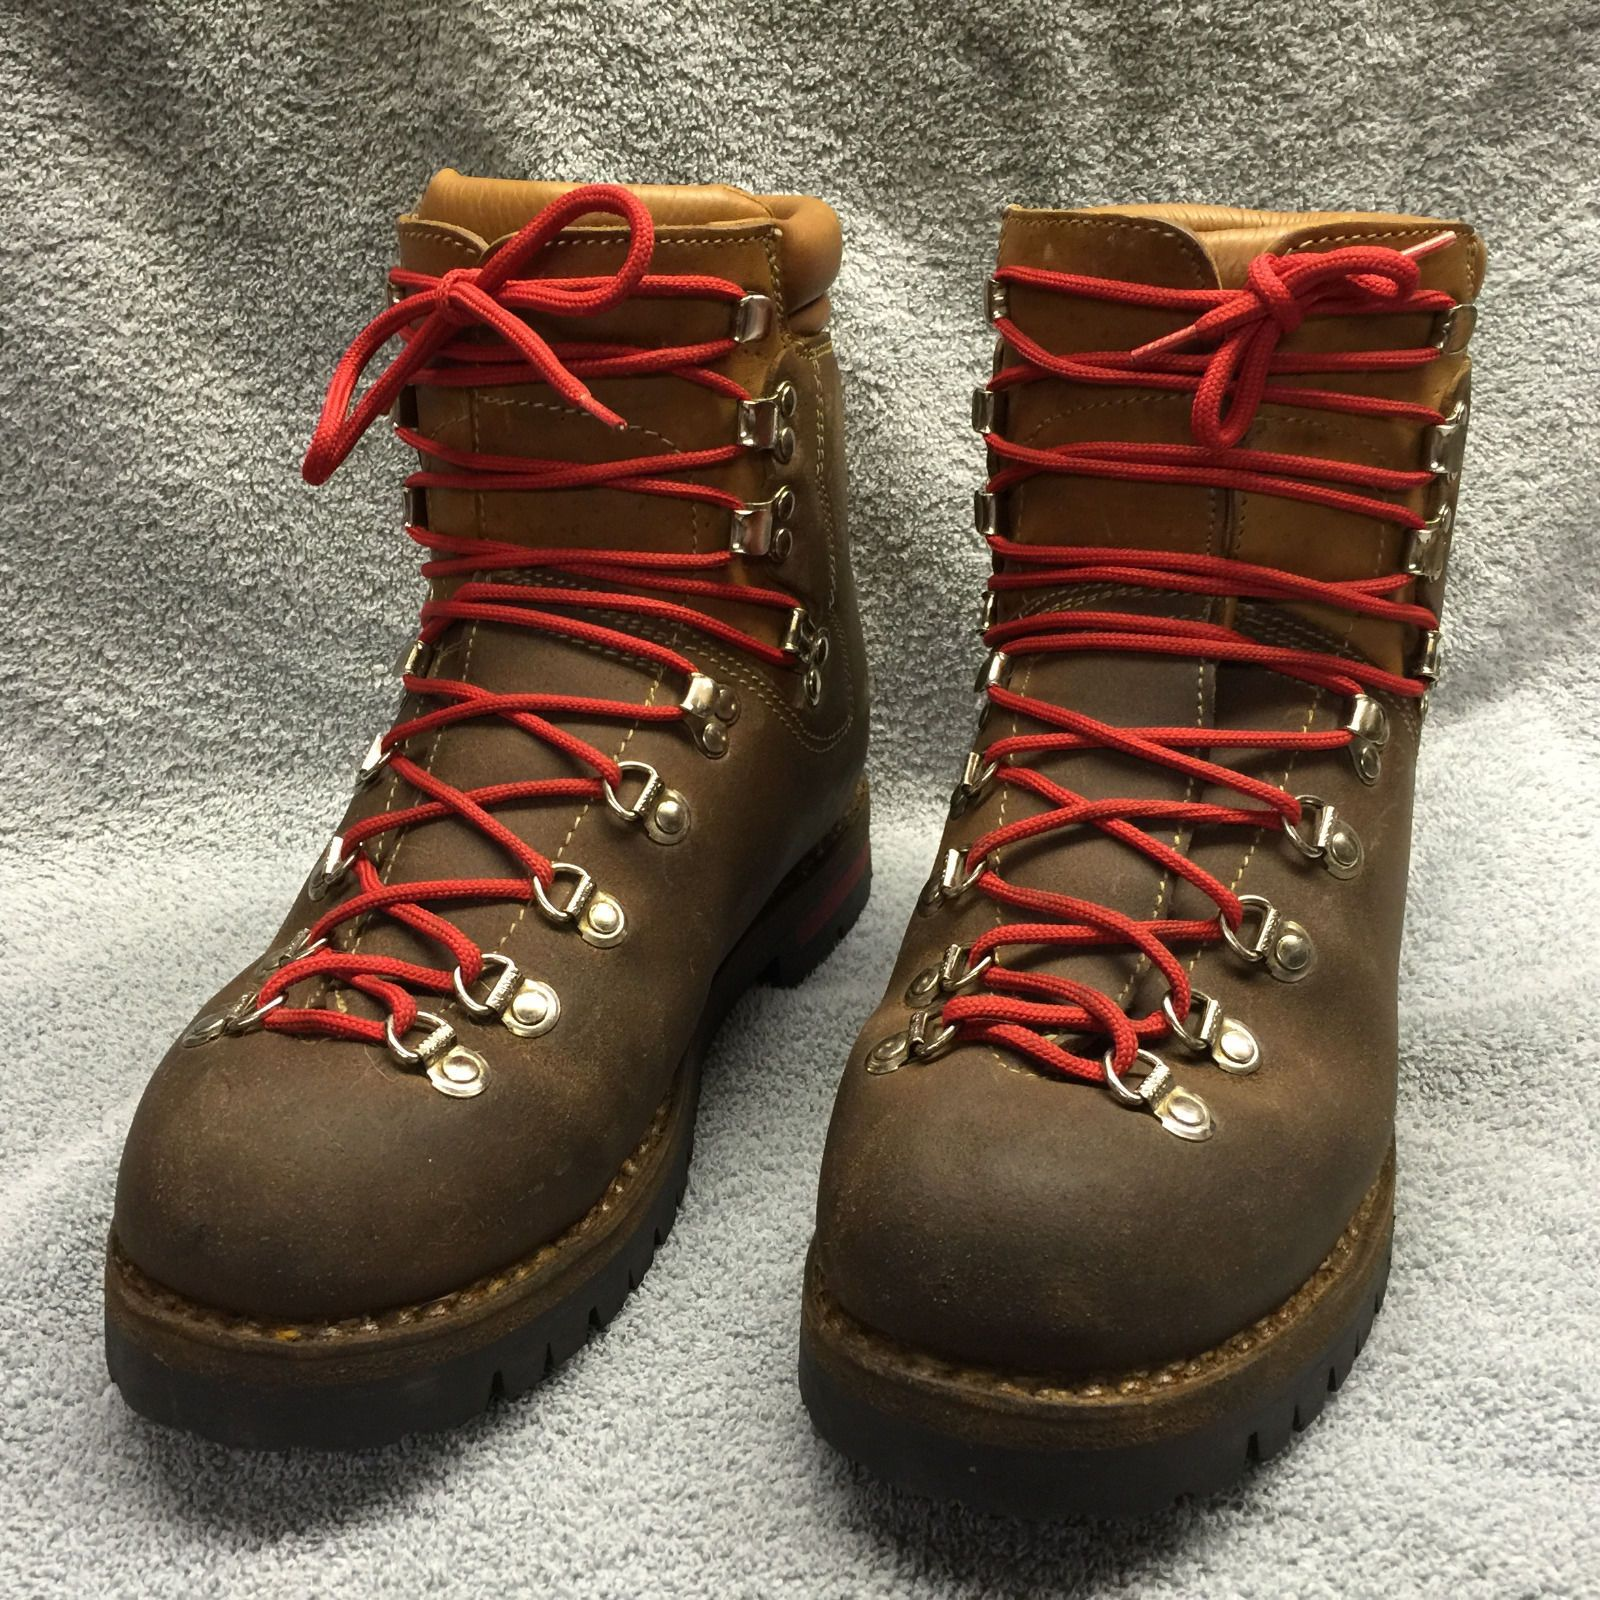 Fabiano Scarpa Mountaineering Hiking Boot Men S 8 Made In